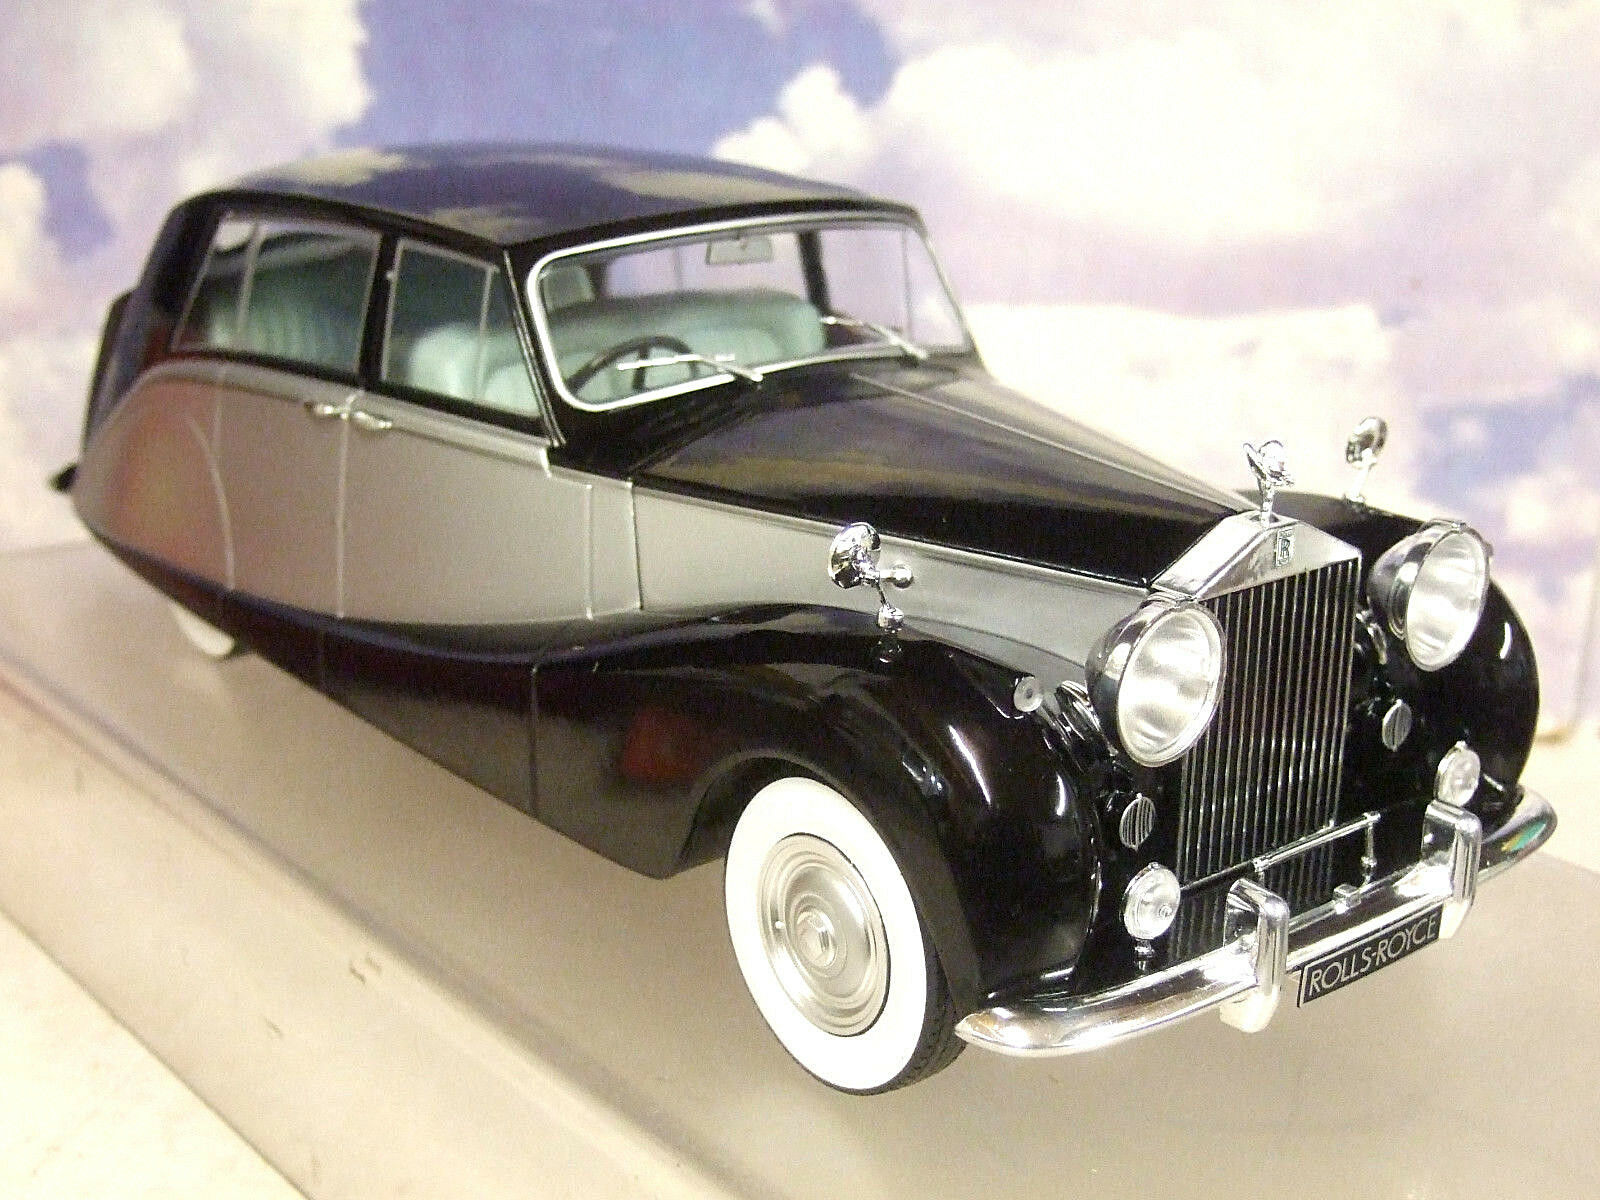 Mcg 1/18 Pressofuso 1956 Rolls Royce Argento Wraith Hooper Empress Nero e